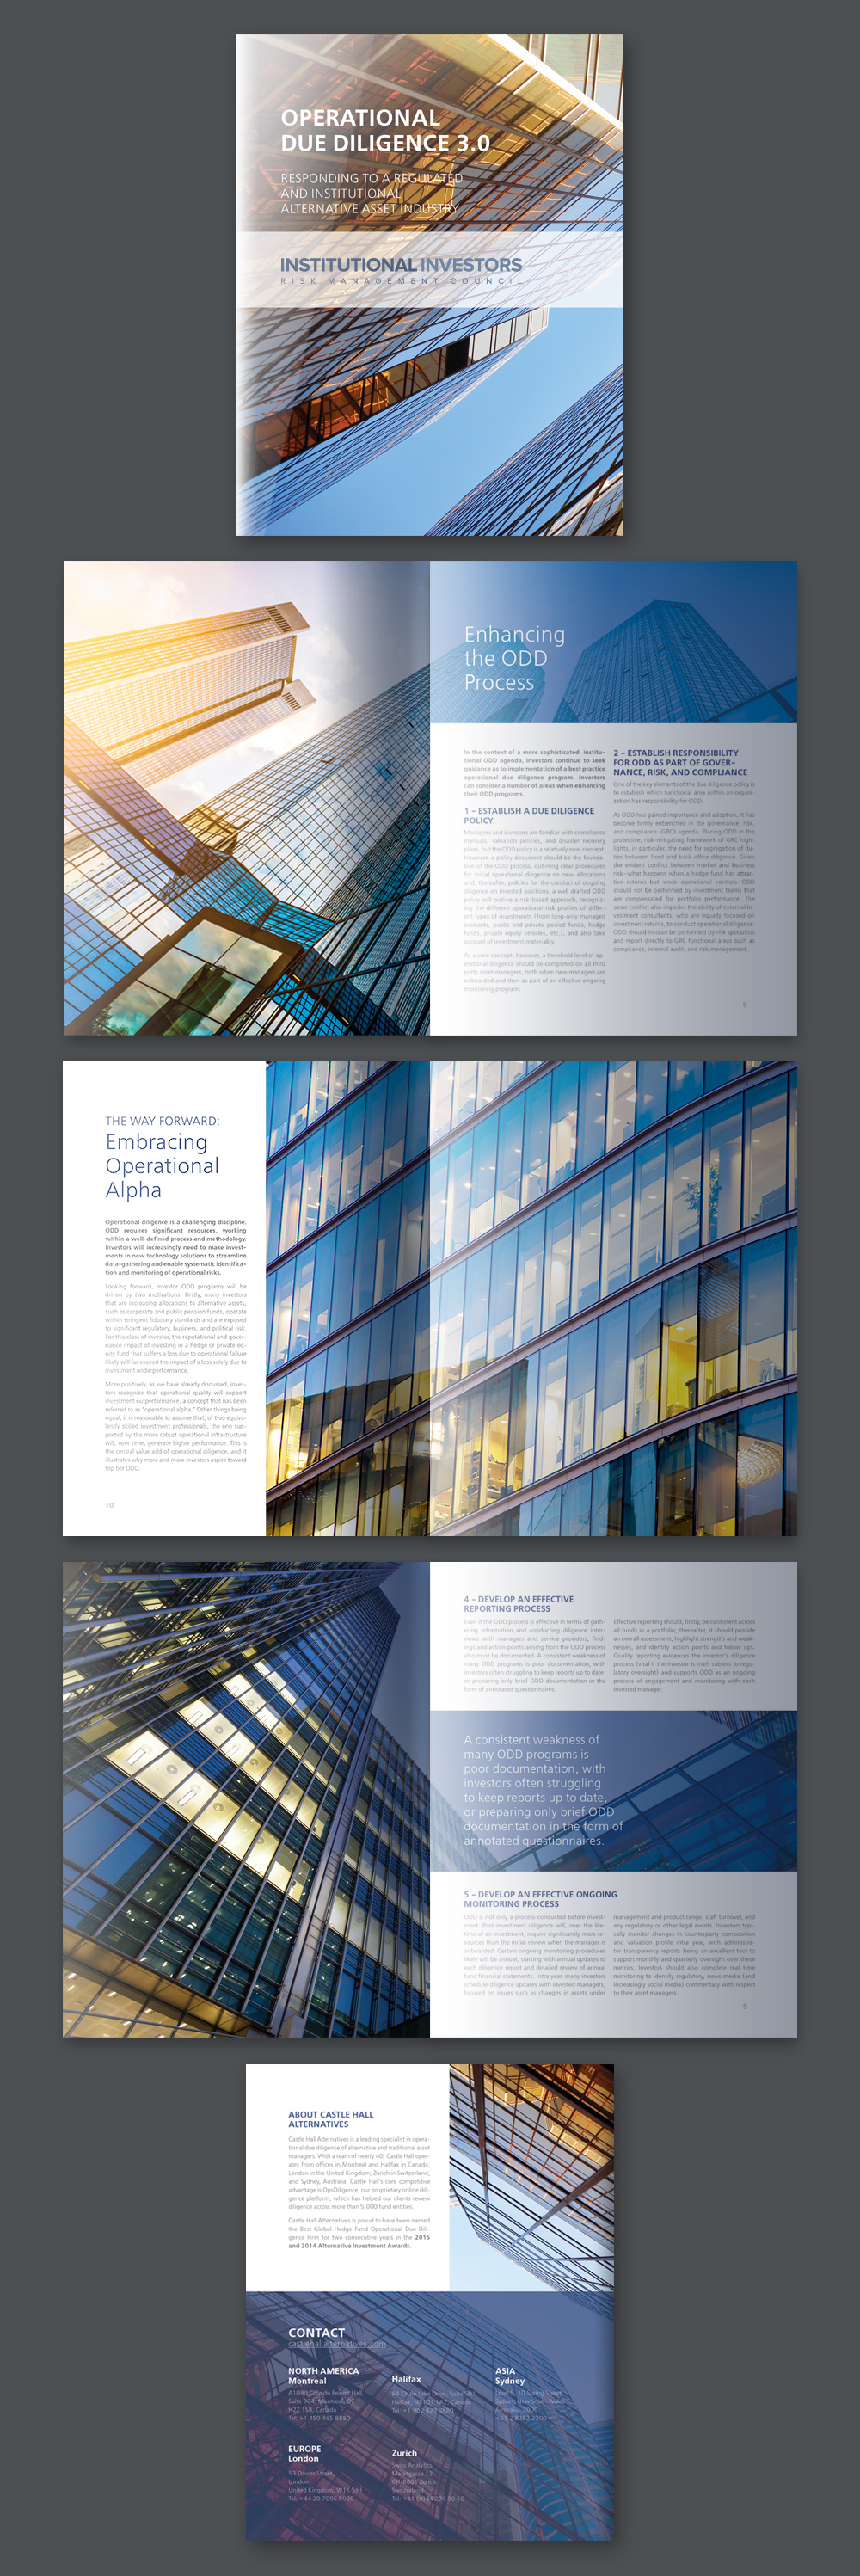 iirmc financial company brochure design on behance